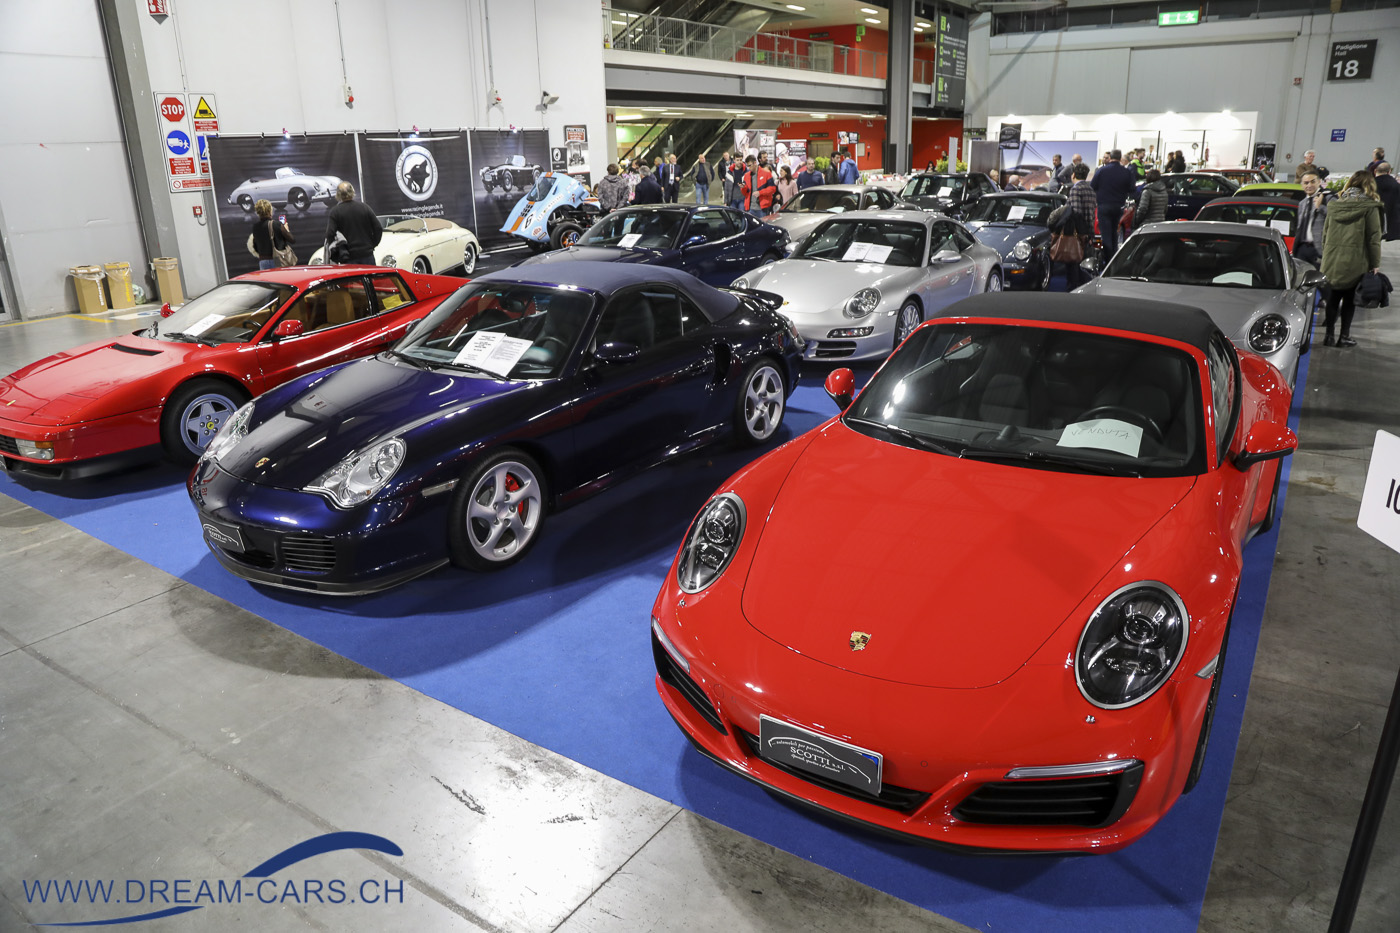 Porsche an der Milano AutoClassica 2019